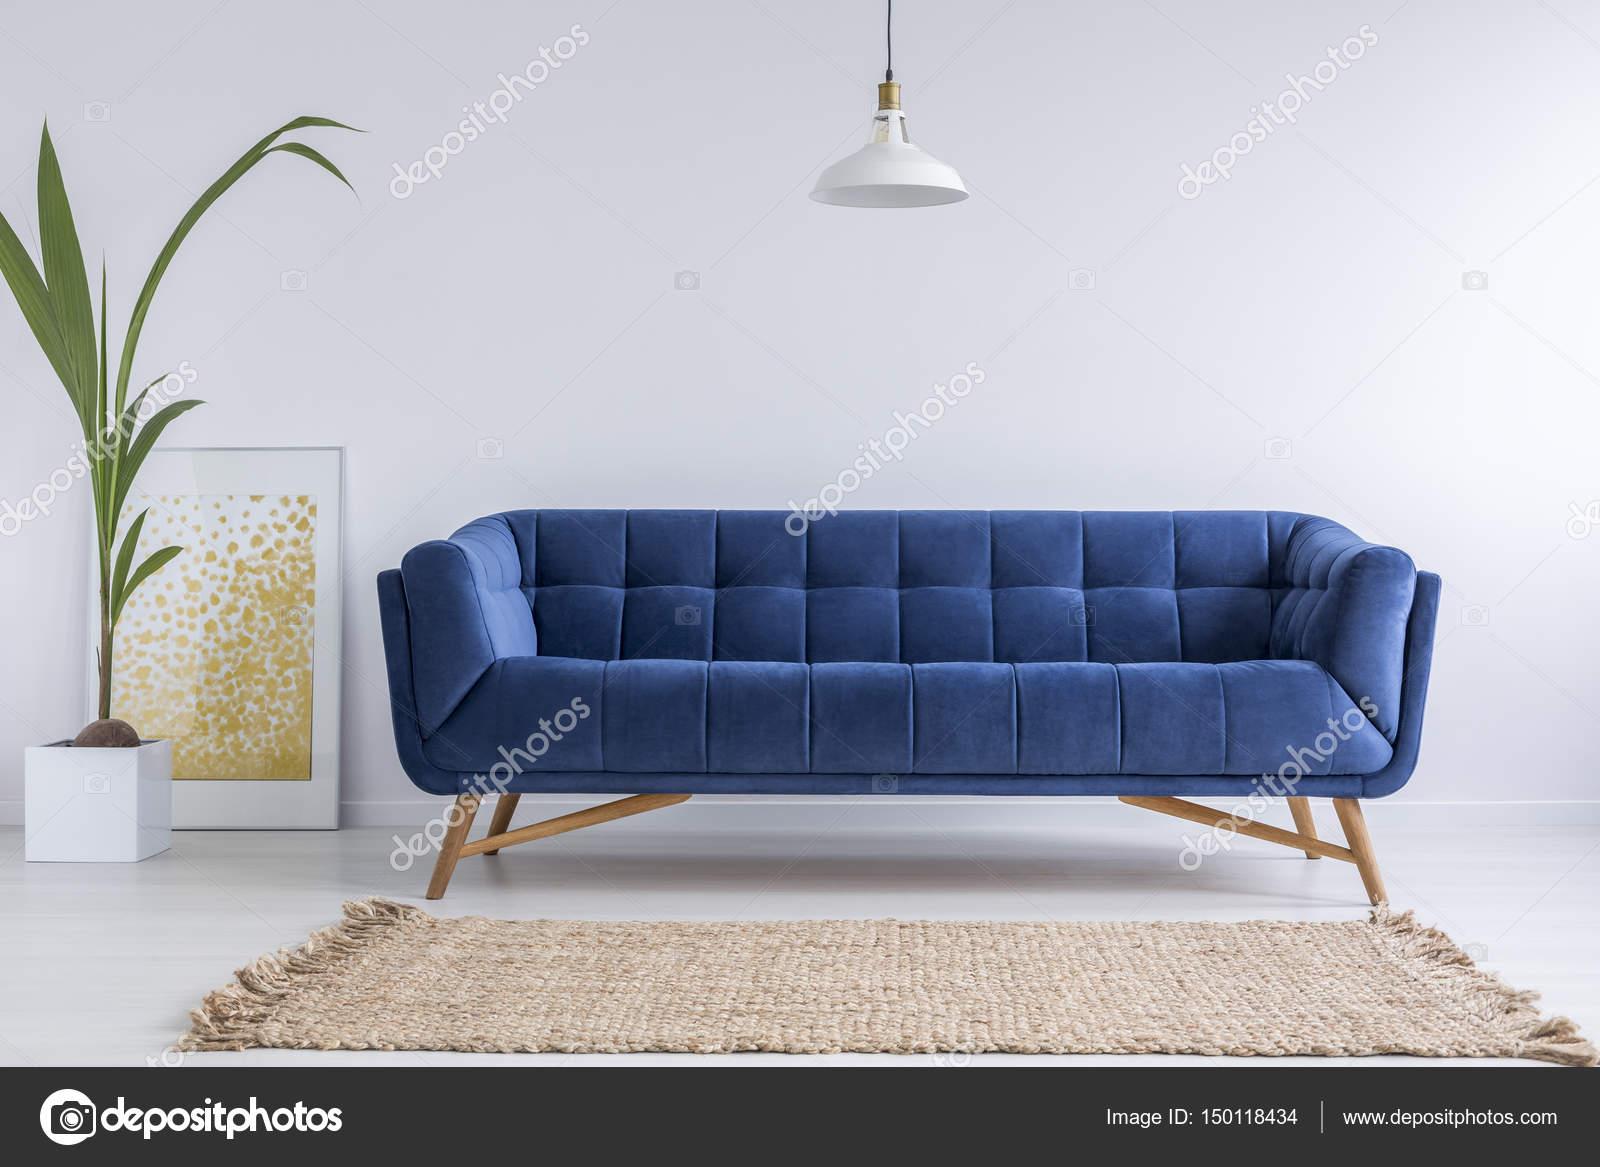 Blaues Sofa und Wicker Teppich — Stockfoto © photographee.eu #150118434